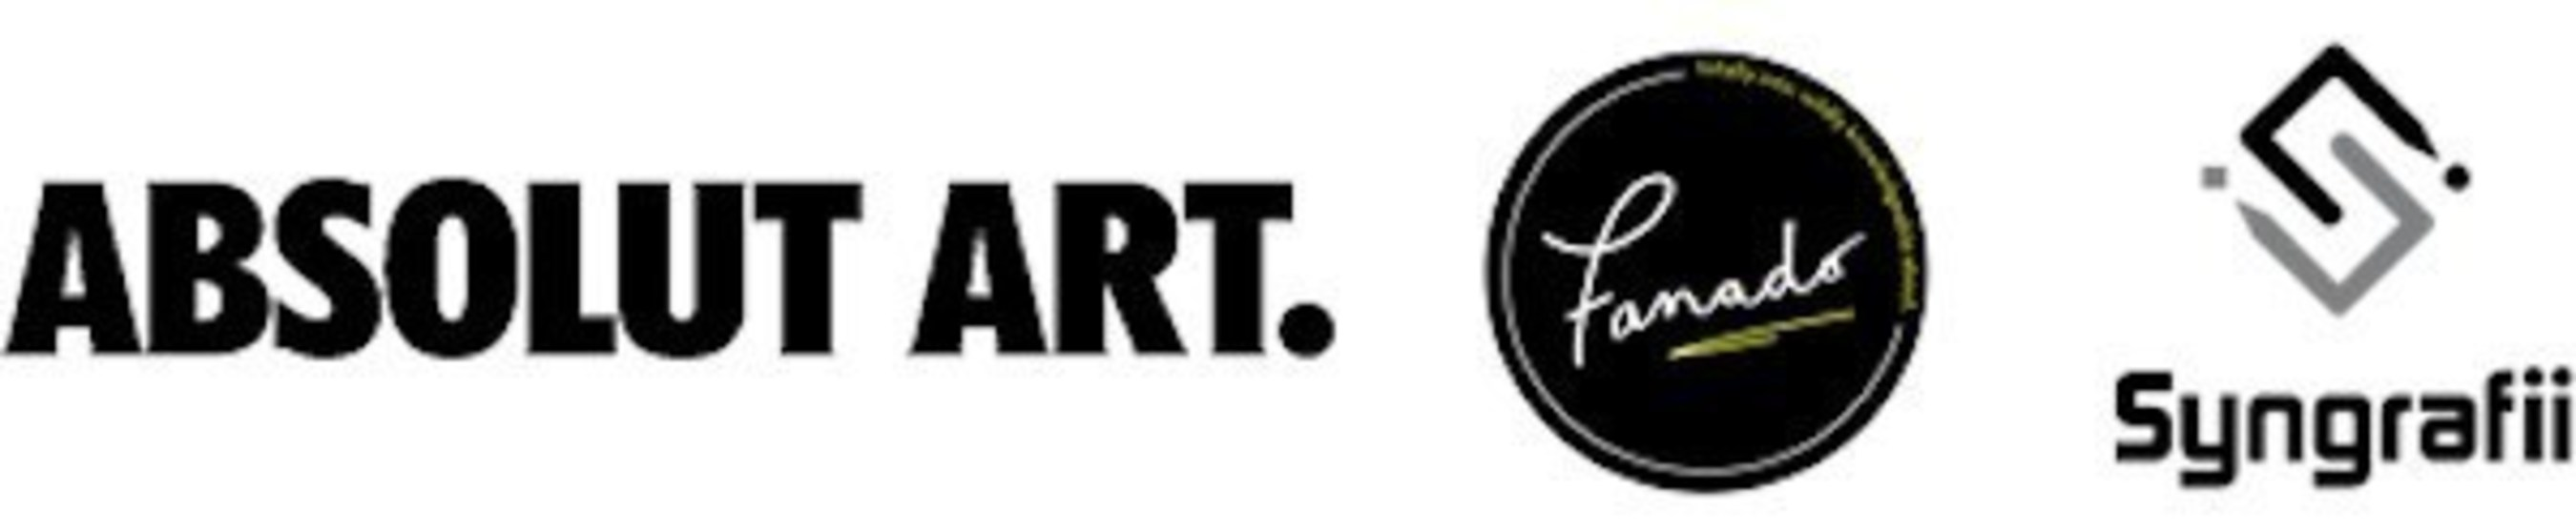 Absolut Art, Fanado, and Syngrafii logos